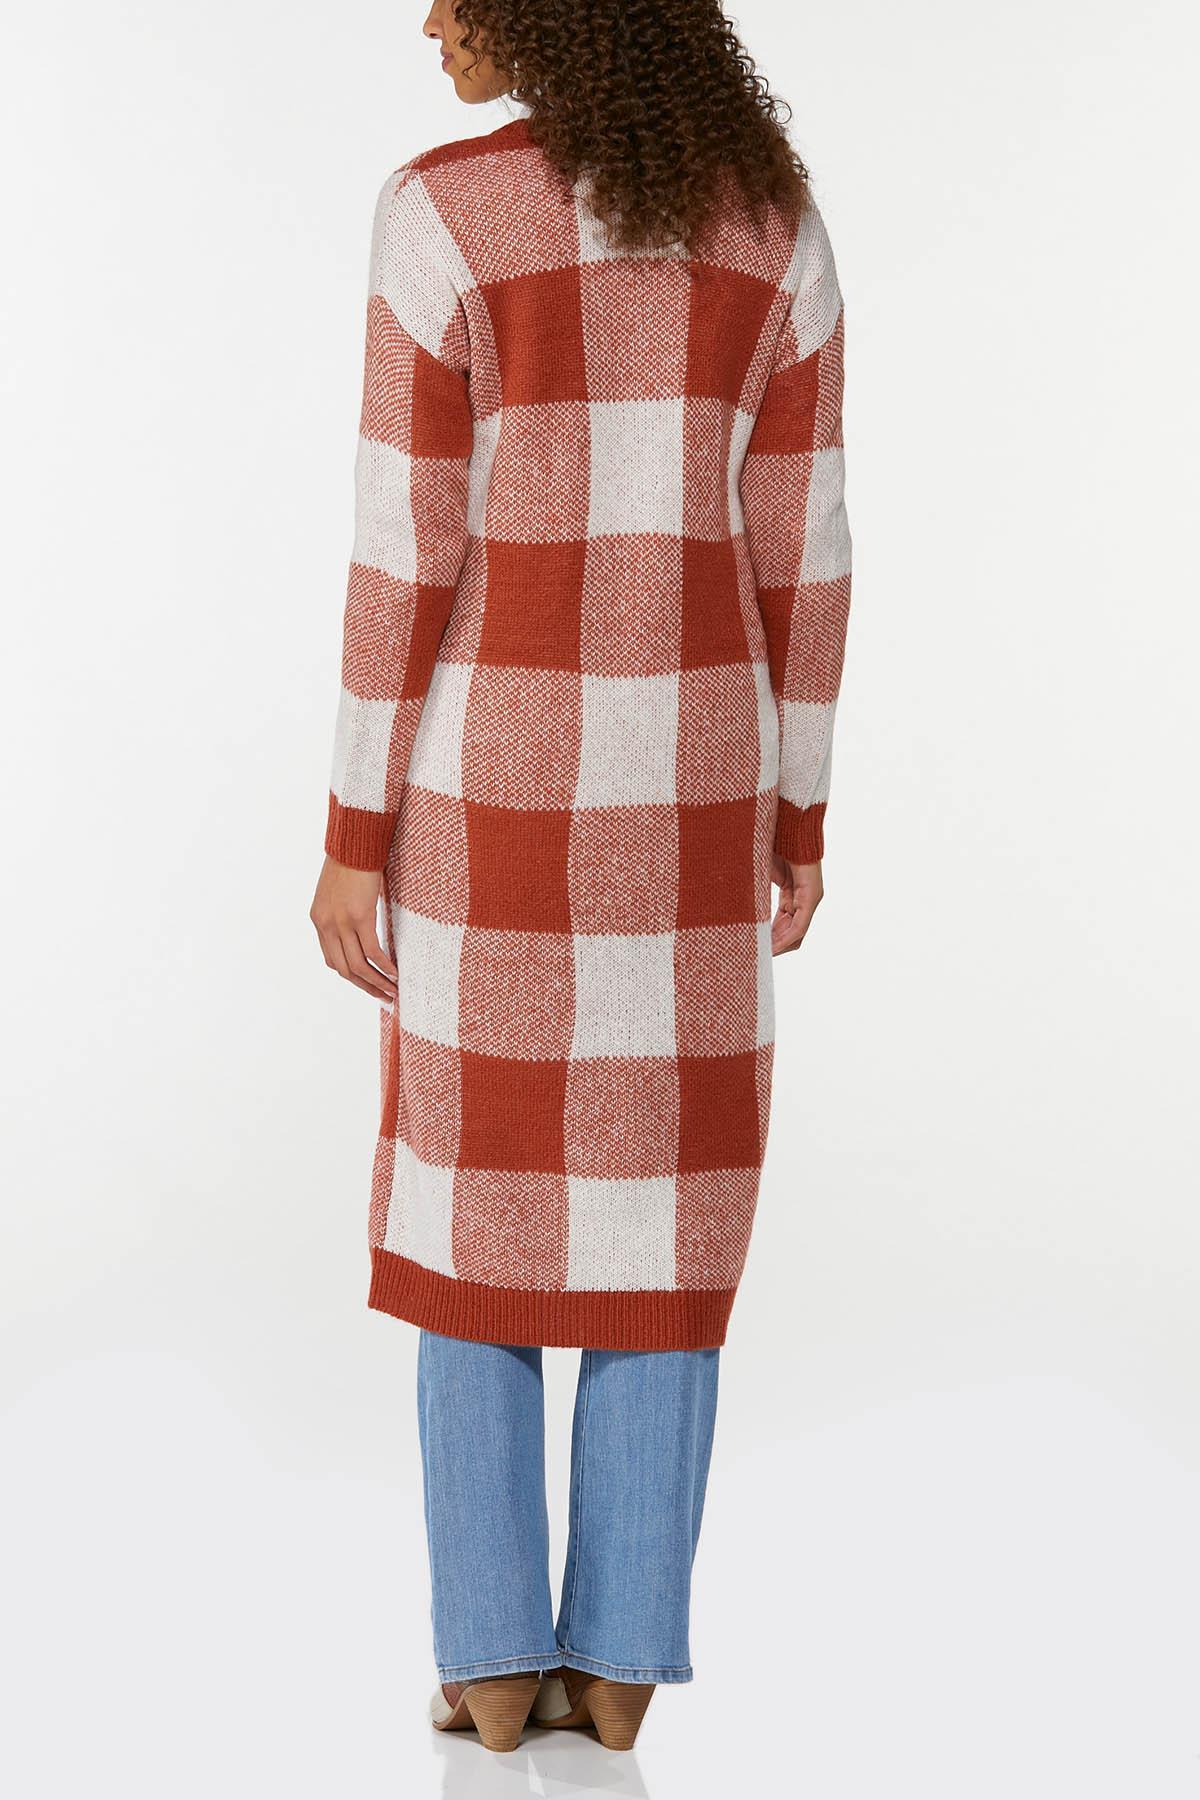 Plus Size Amber Plaid Cardigan Sweater (Item #44656374)